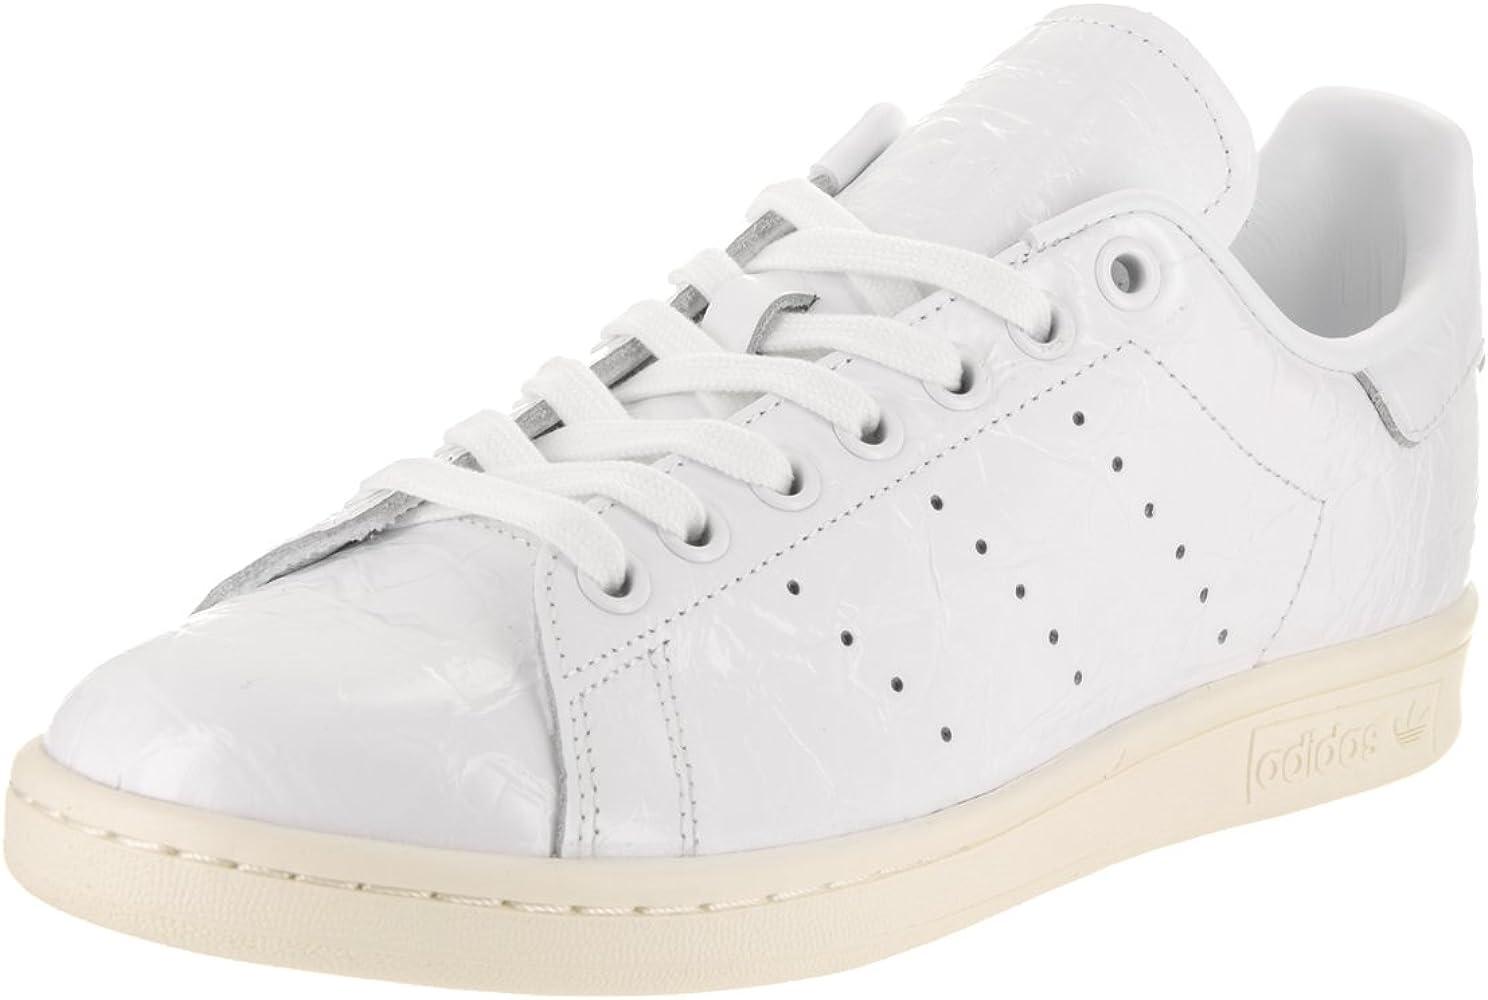 adidas Womens Stan Smith Tennis Casual